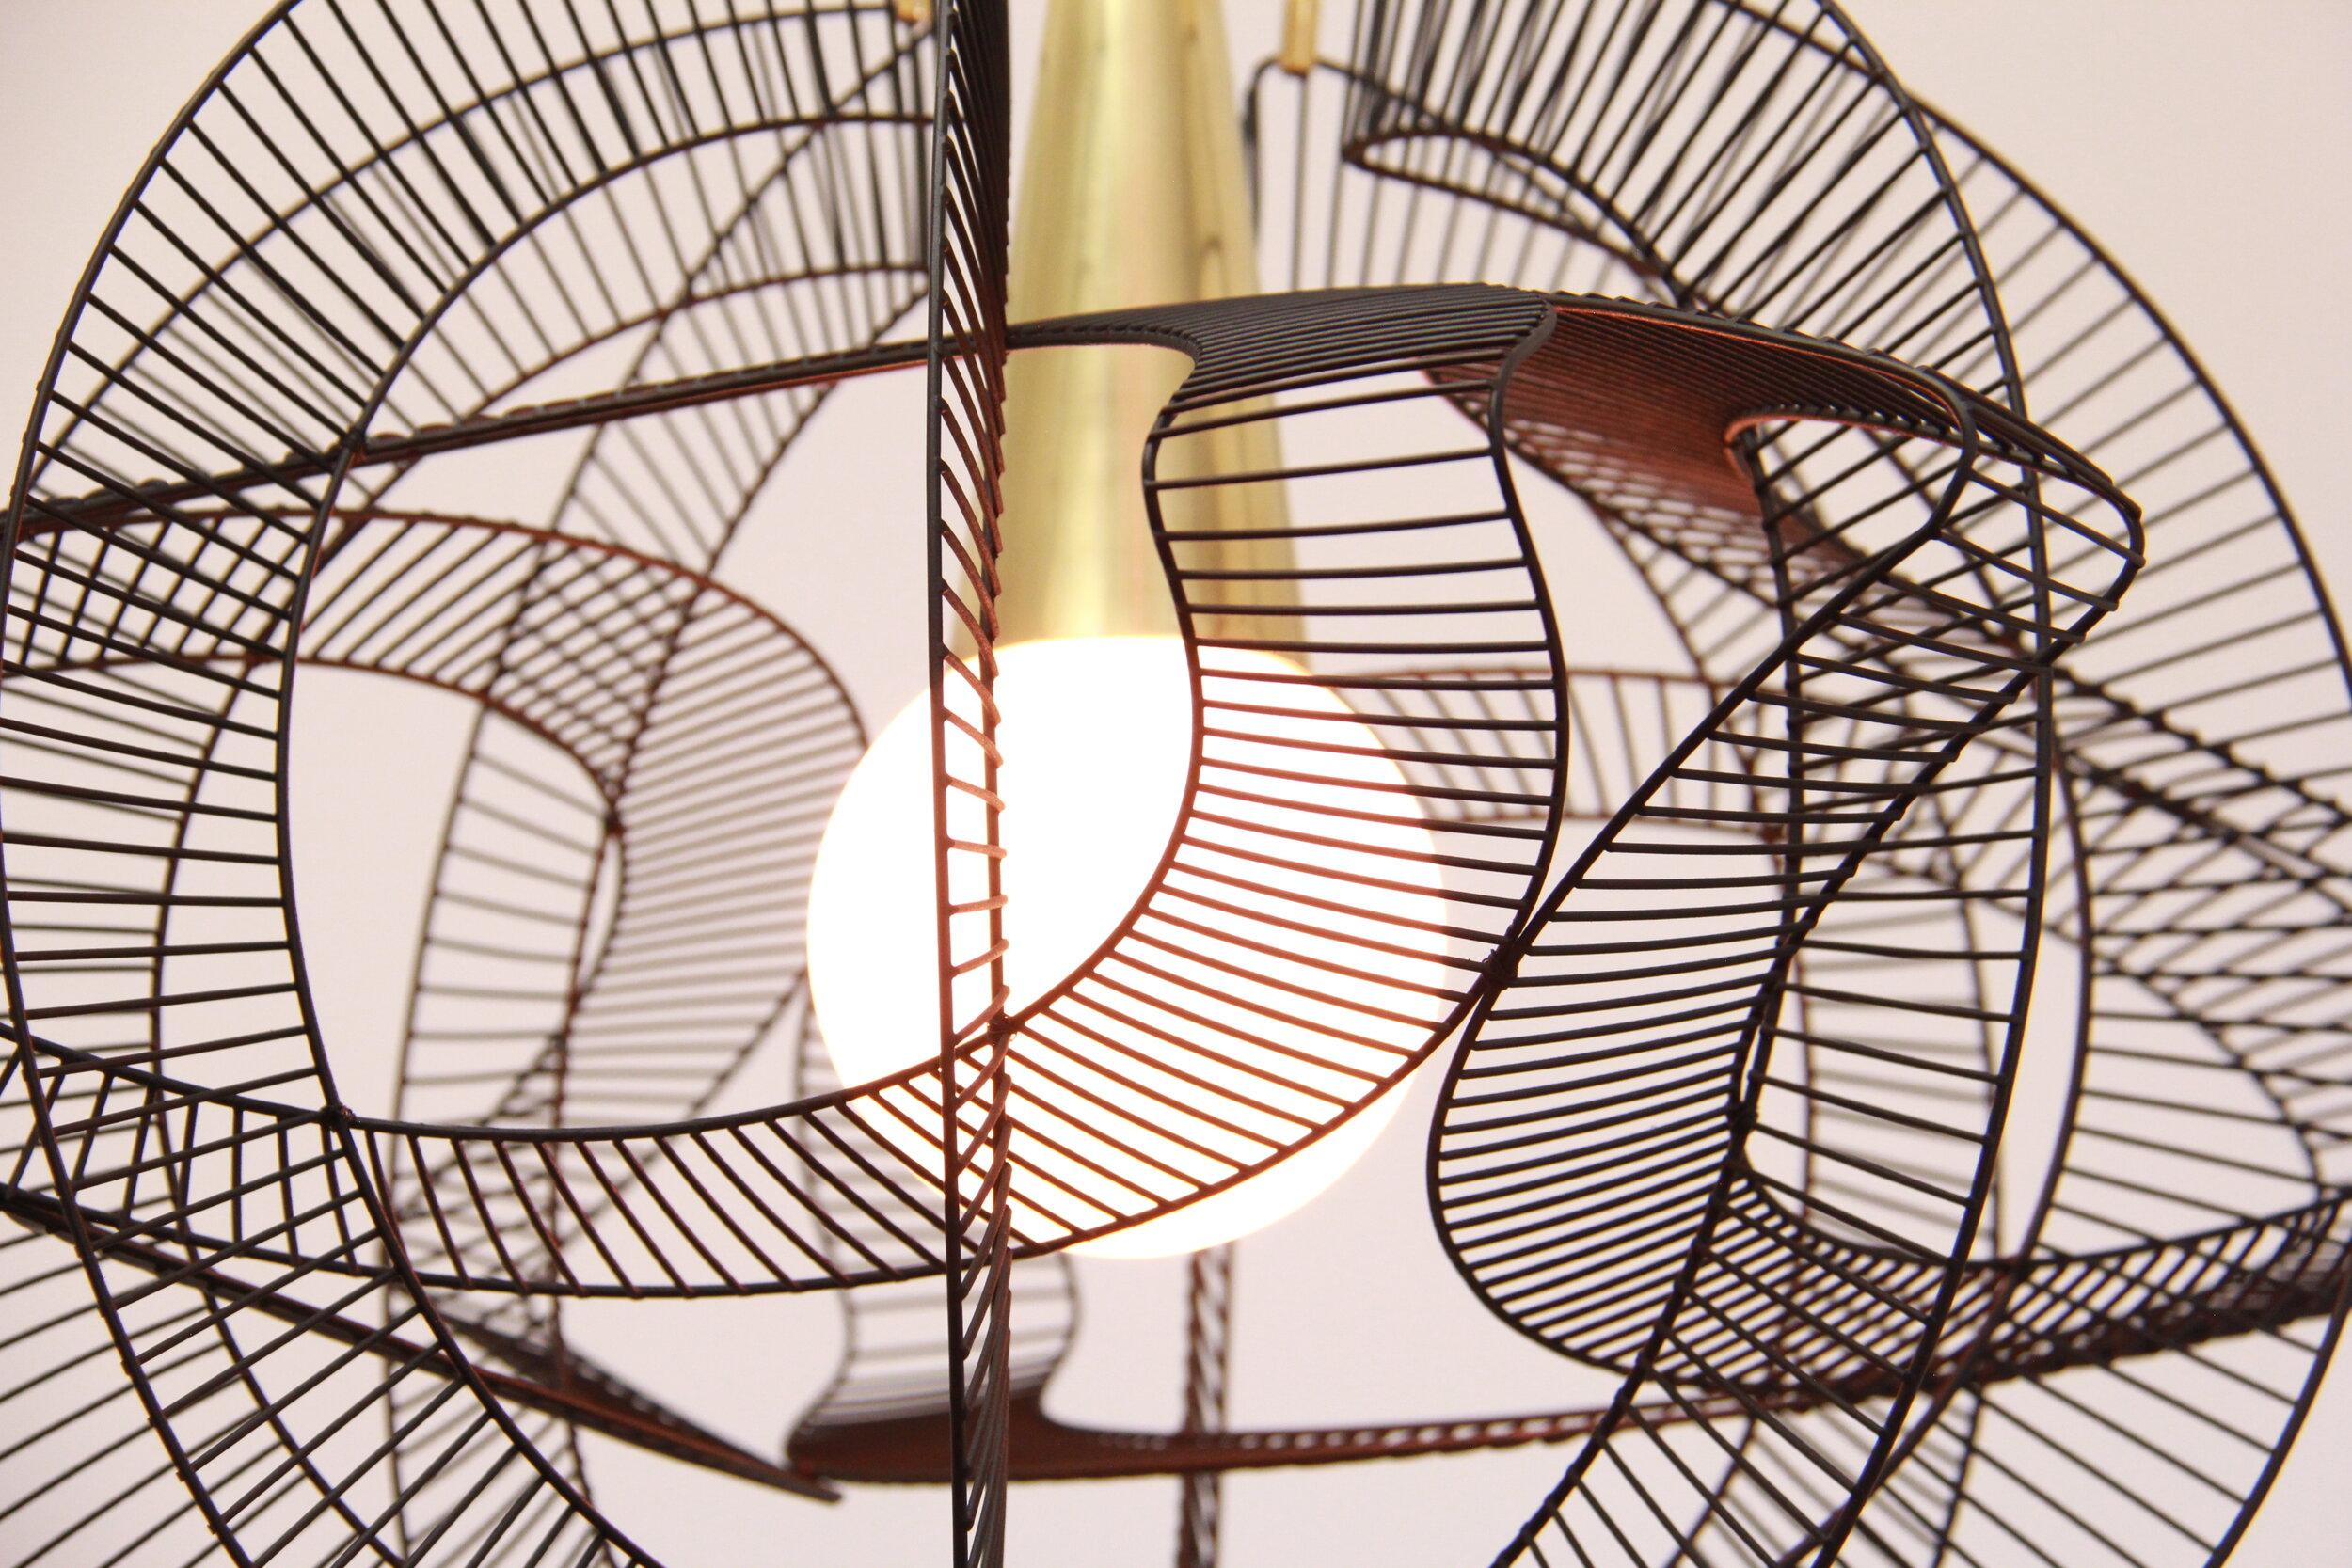 Olas_Sphera_black_brass_luminaire_design_lampe_lamp_studio-botte_pendant 3.JPG